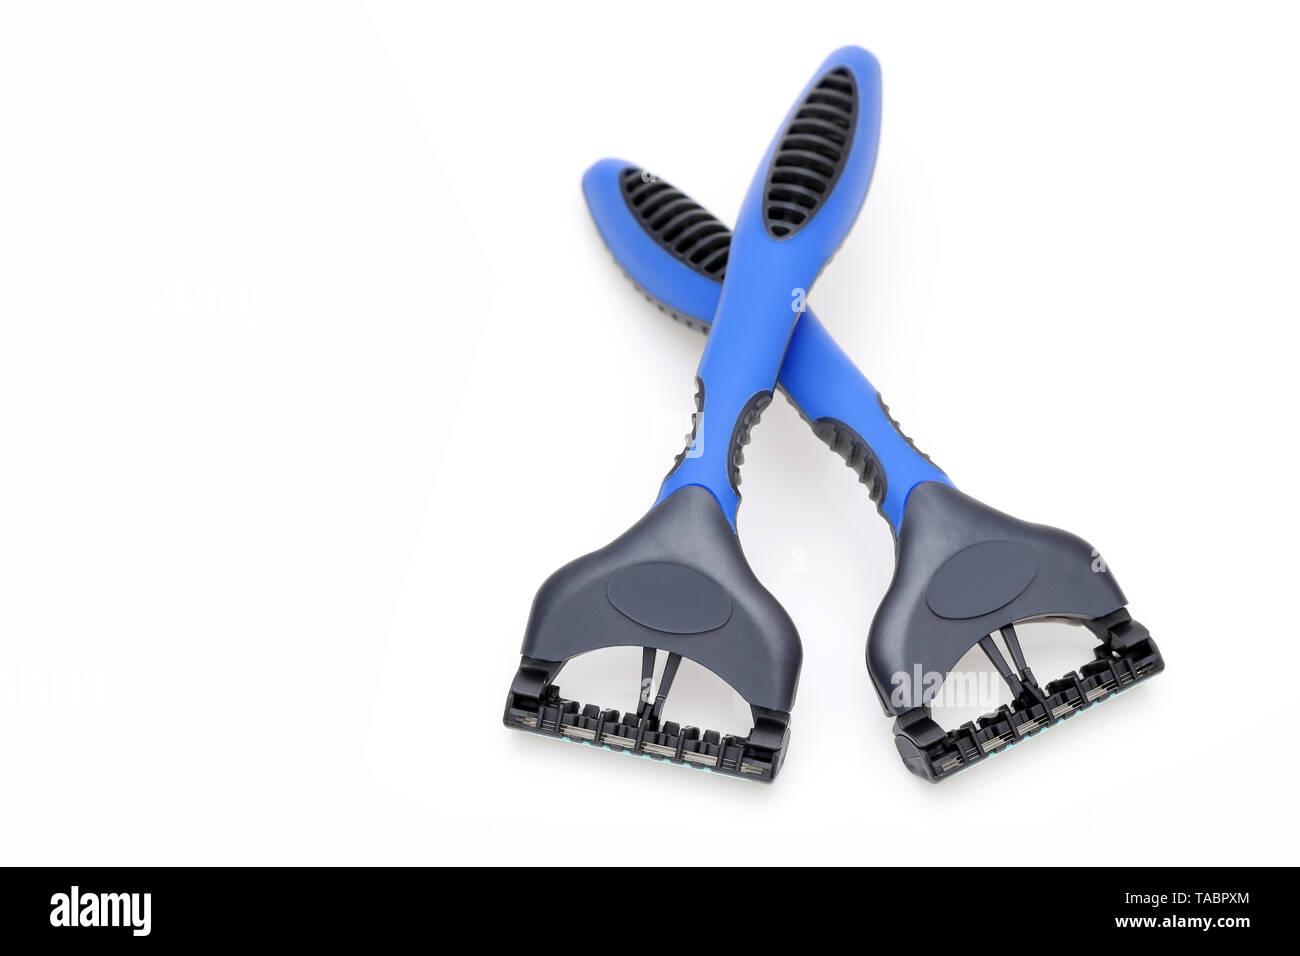 blue disposable shaving razor on white background - Stock Image